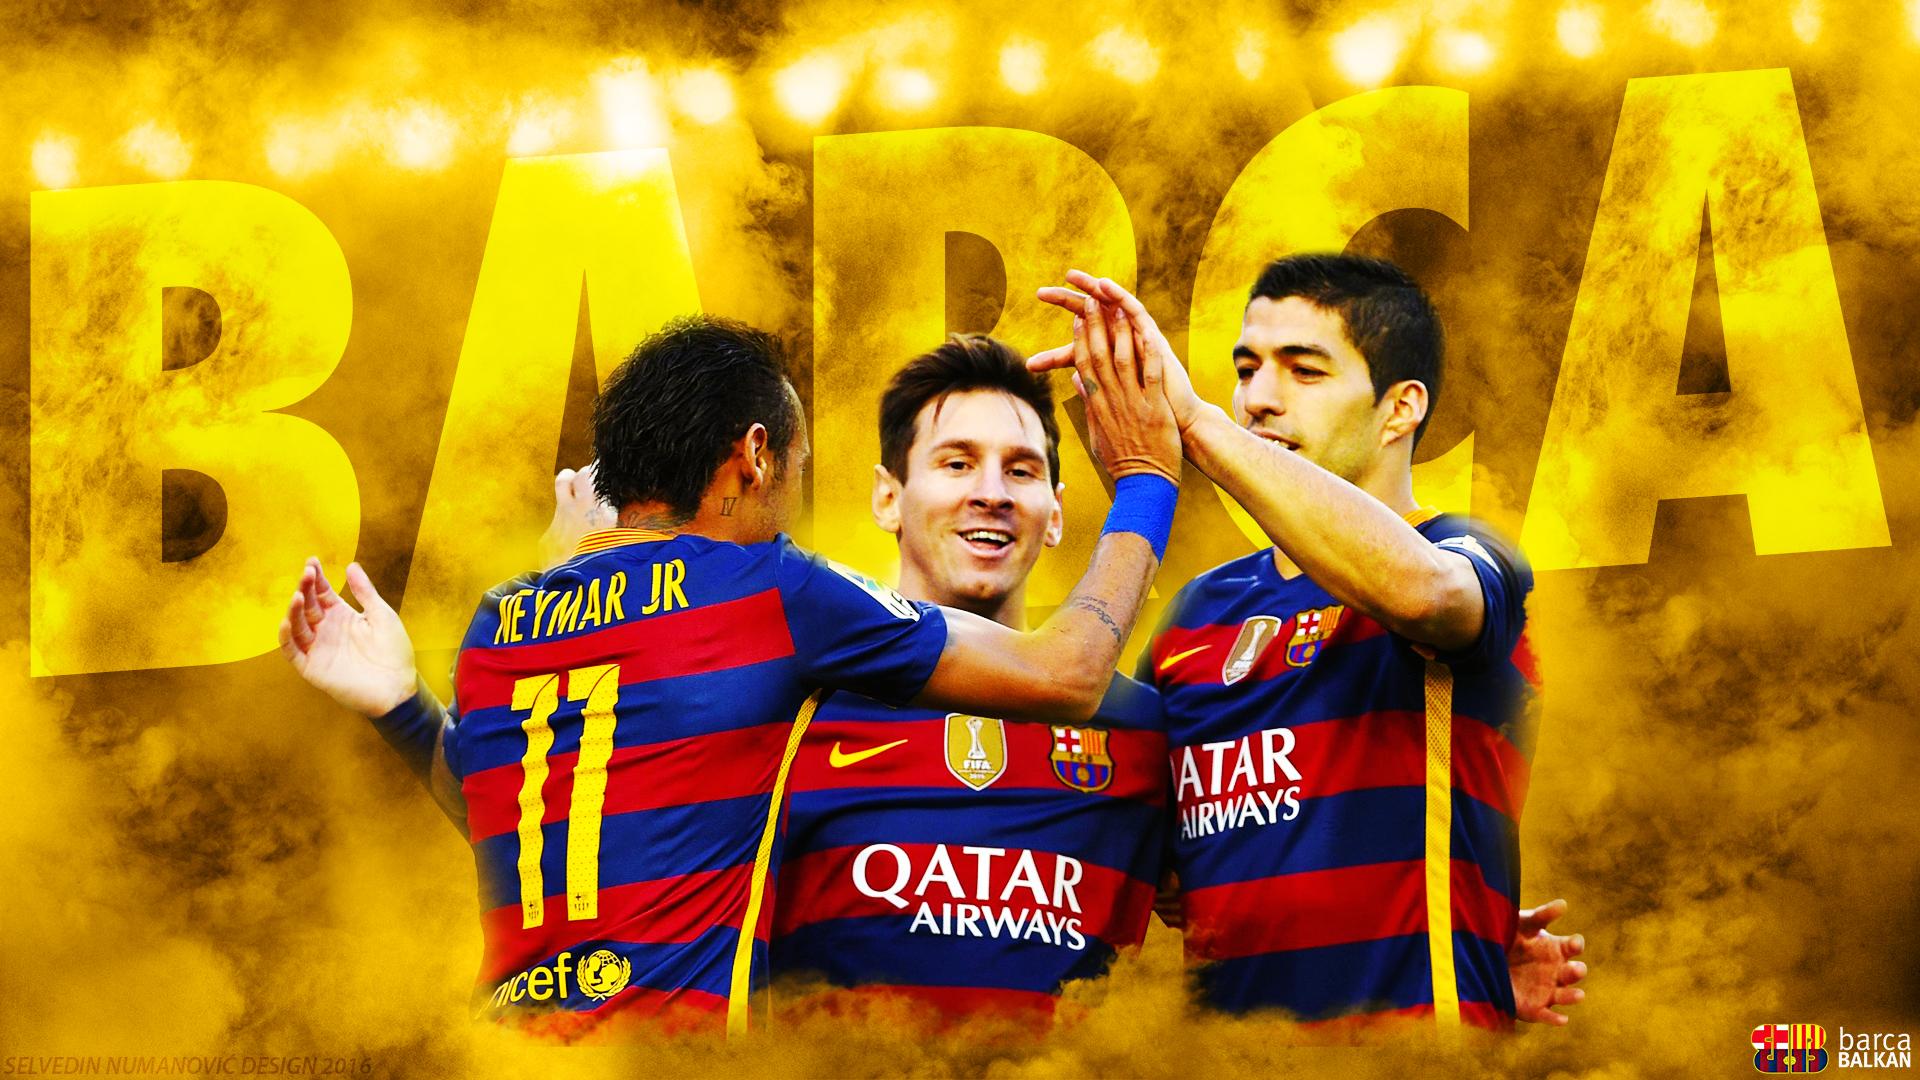 Messi Suarez Neymar 2016   HD WALLPAPER by SelvedinFCB 1920x1080